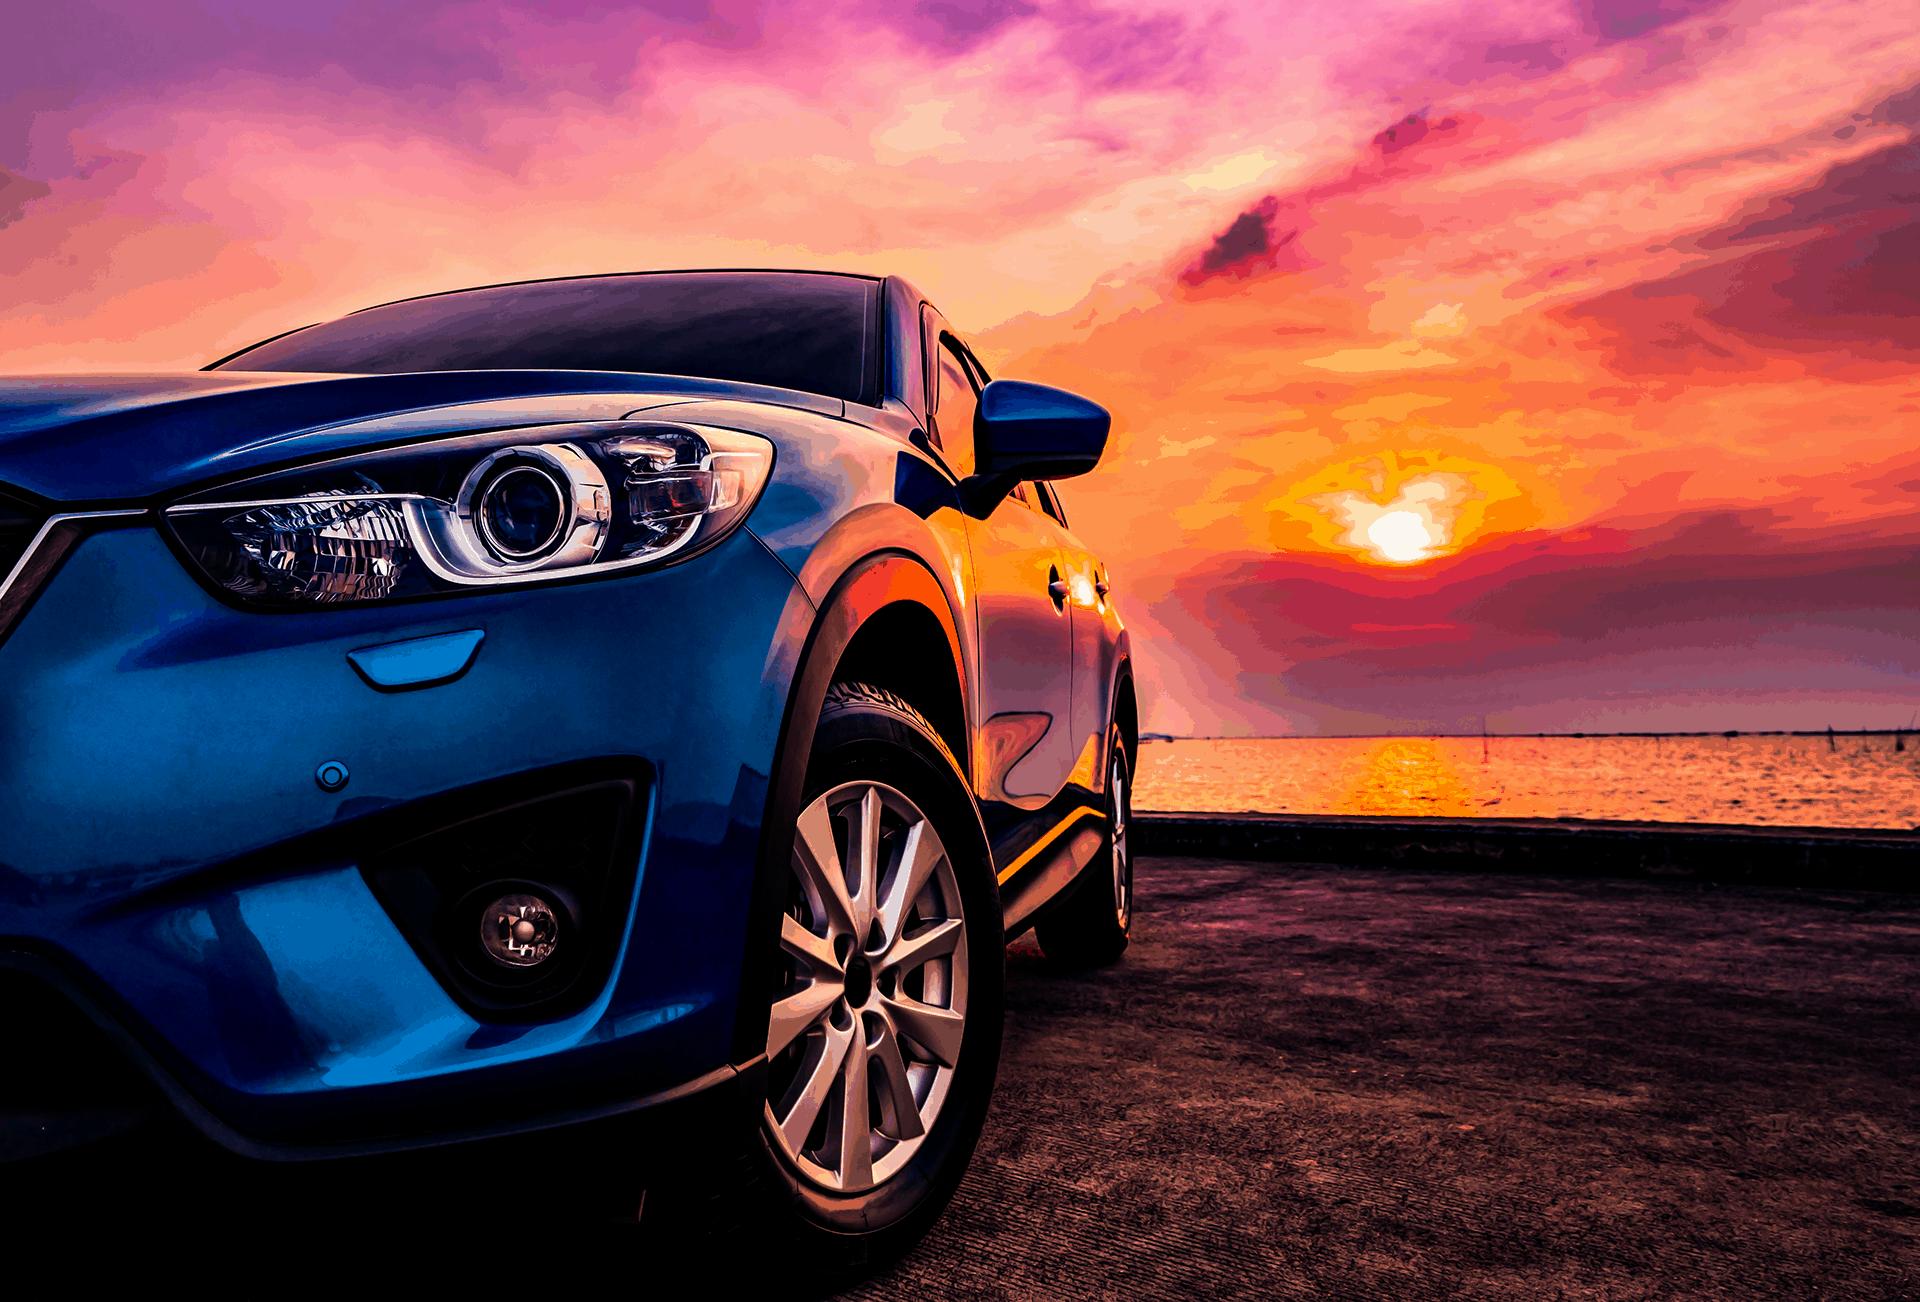 Blue vehicle at sun set